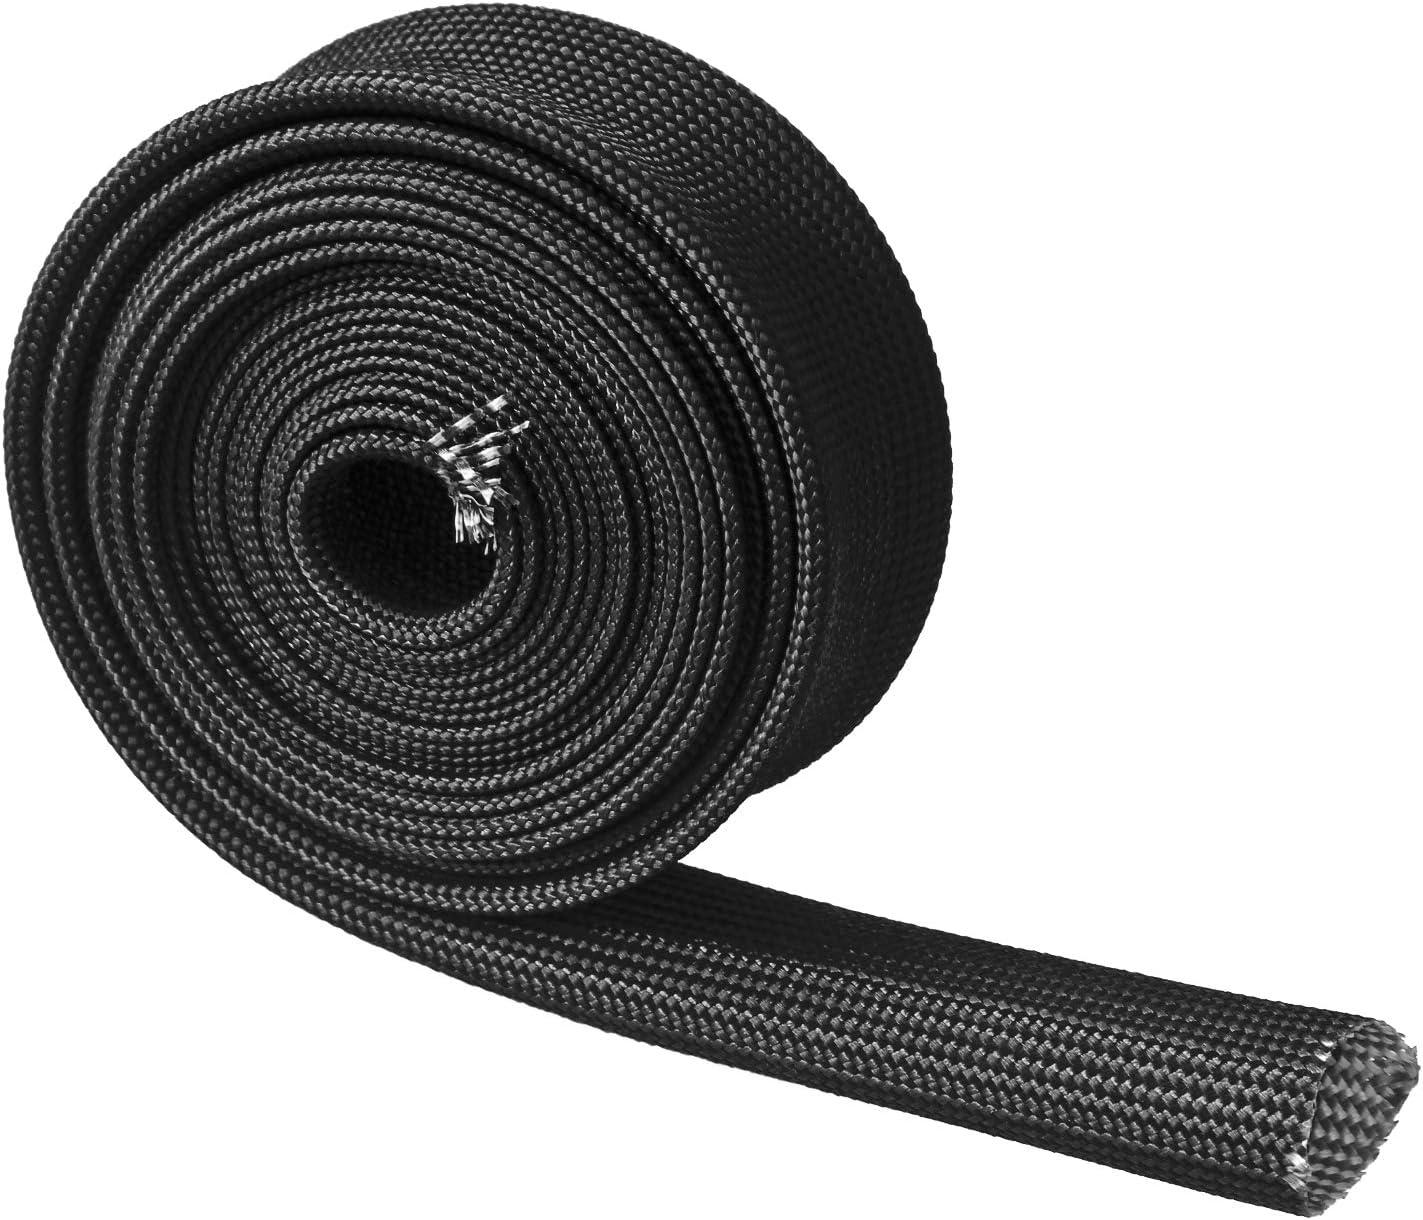 "Auto Heat Sleeve Fiberglass Adjustable Heat Shield 10FT-20MM(3/4"") Black Exhaust Heat Shield For Car Wire Loom Heat Shield Brake Line Cable Heat Shield"